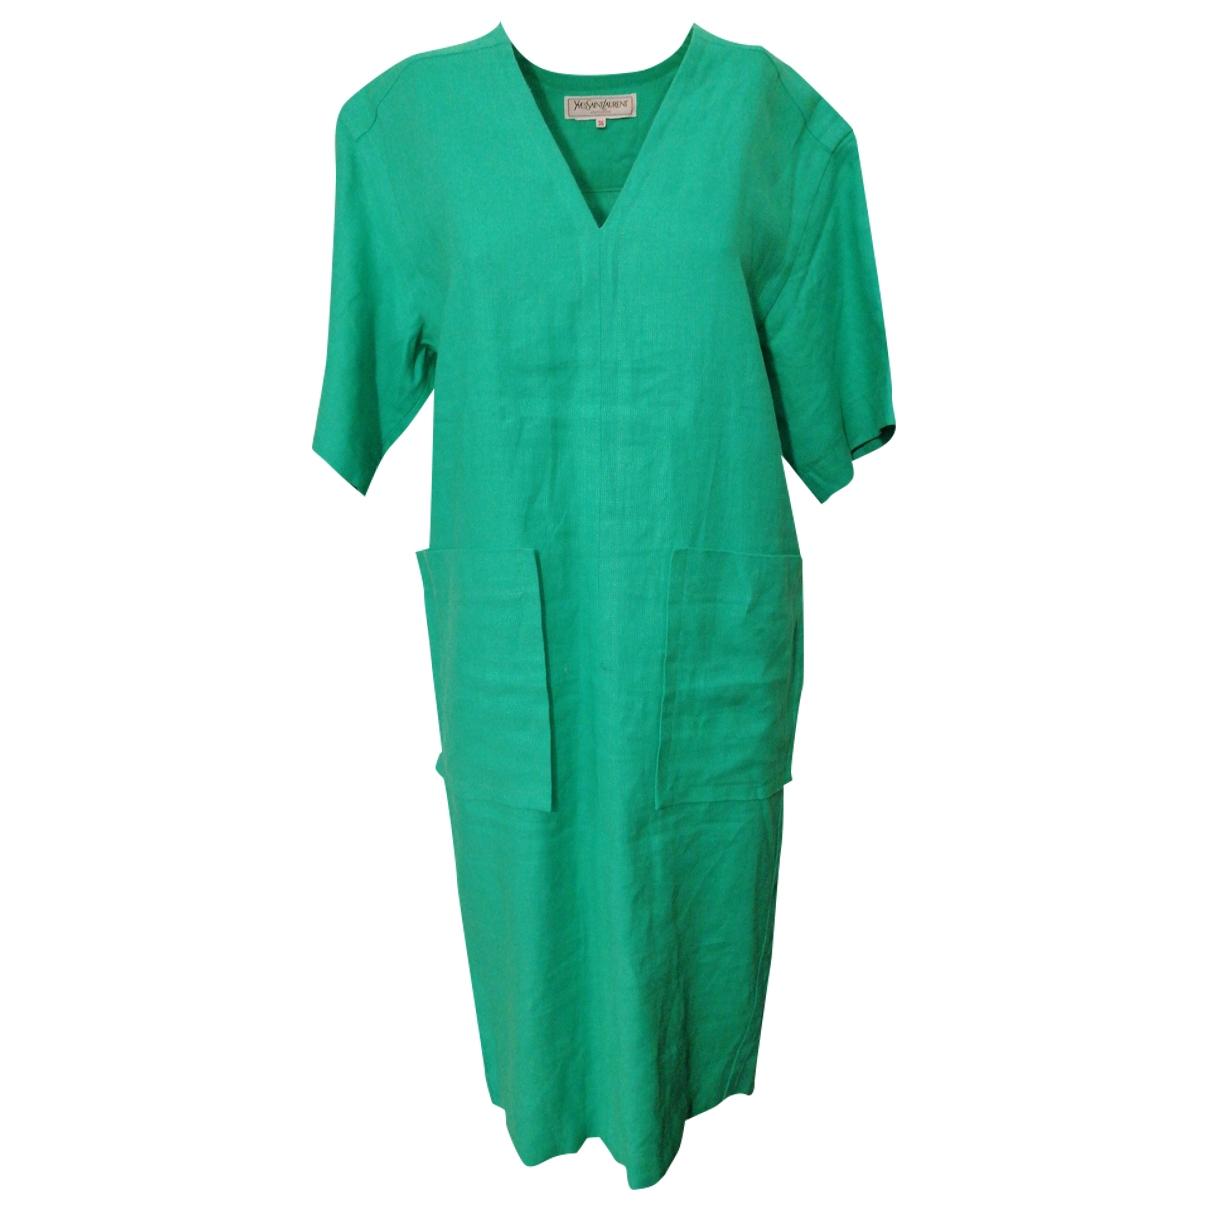 Yves Saint Laurent \N Kleid in  Gruen Leinen